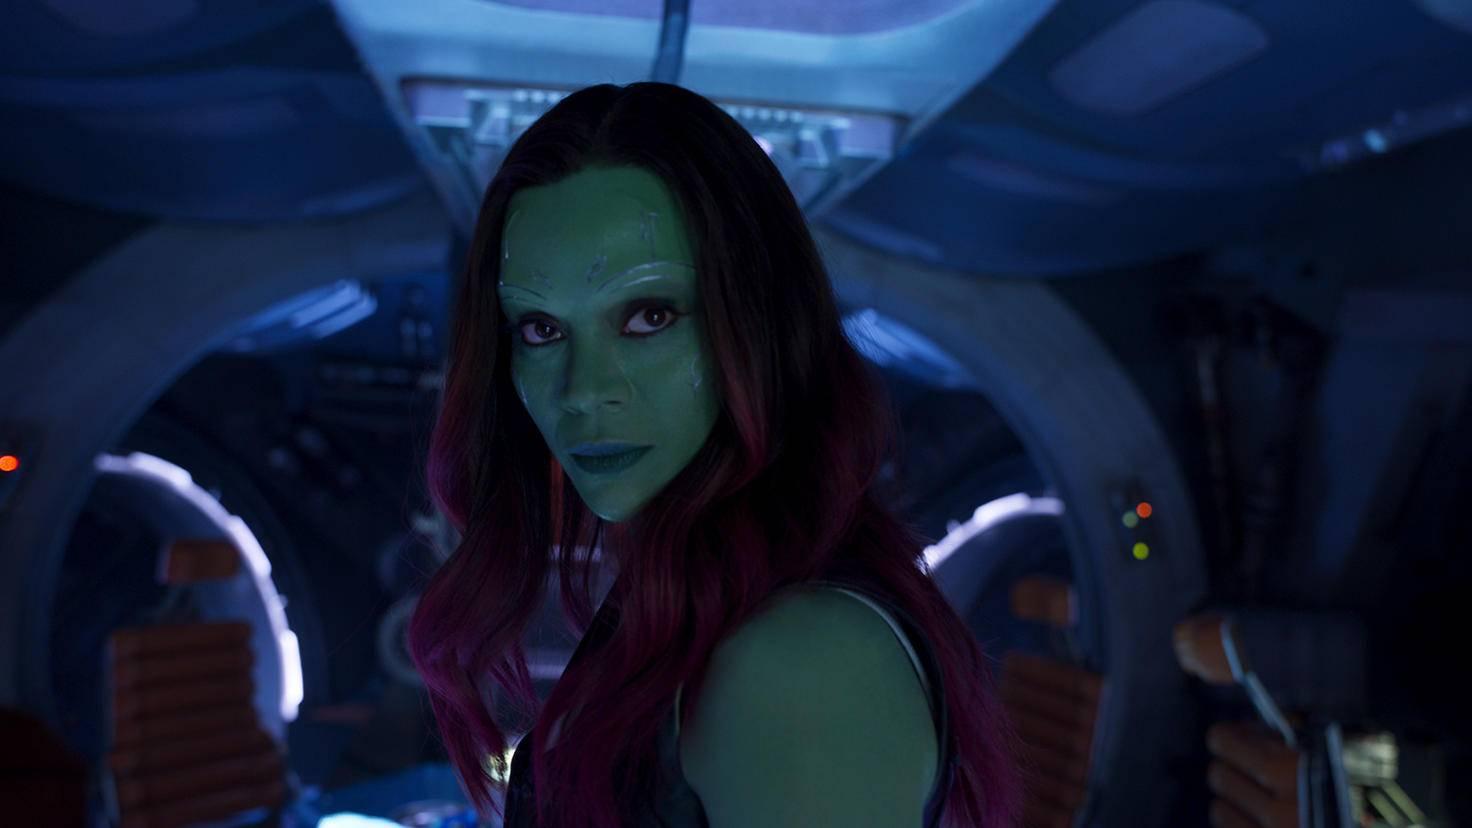 Gamora-Guardians of the Galaxy 2-Disney